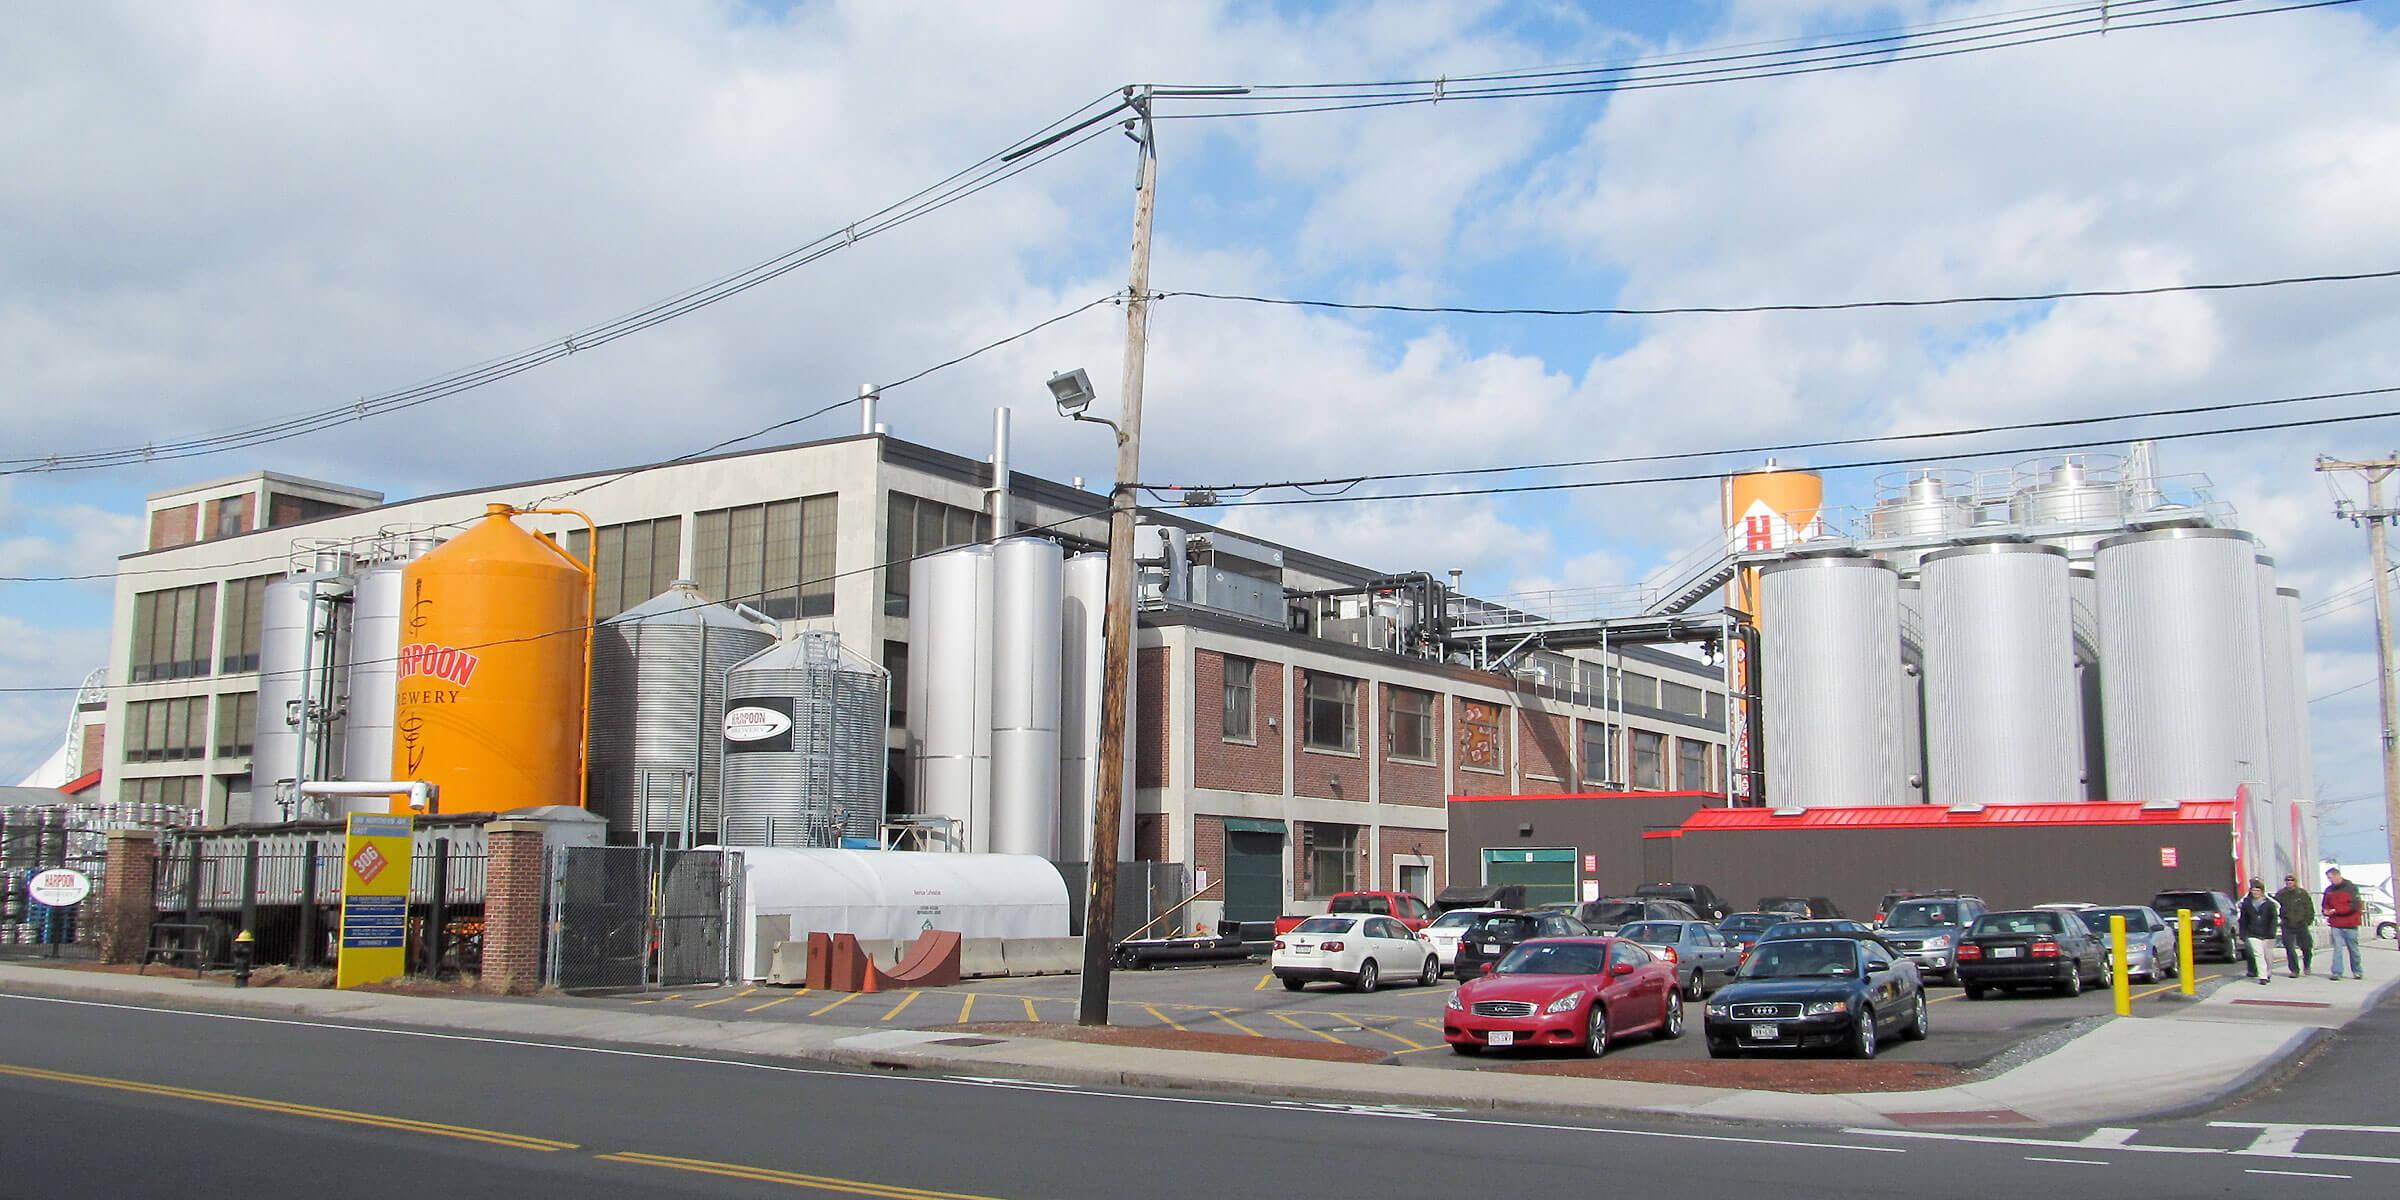 Outside the Harpoon Brewery in Boston, Massachusetts